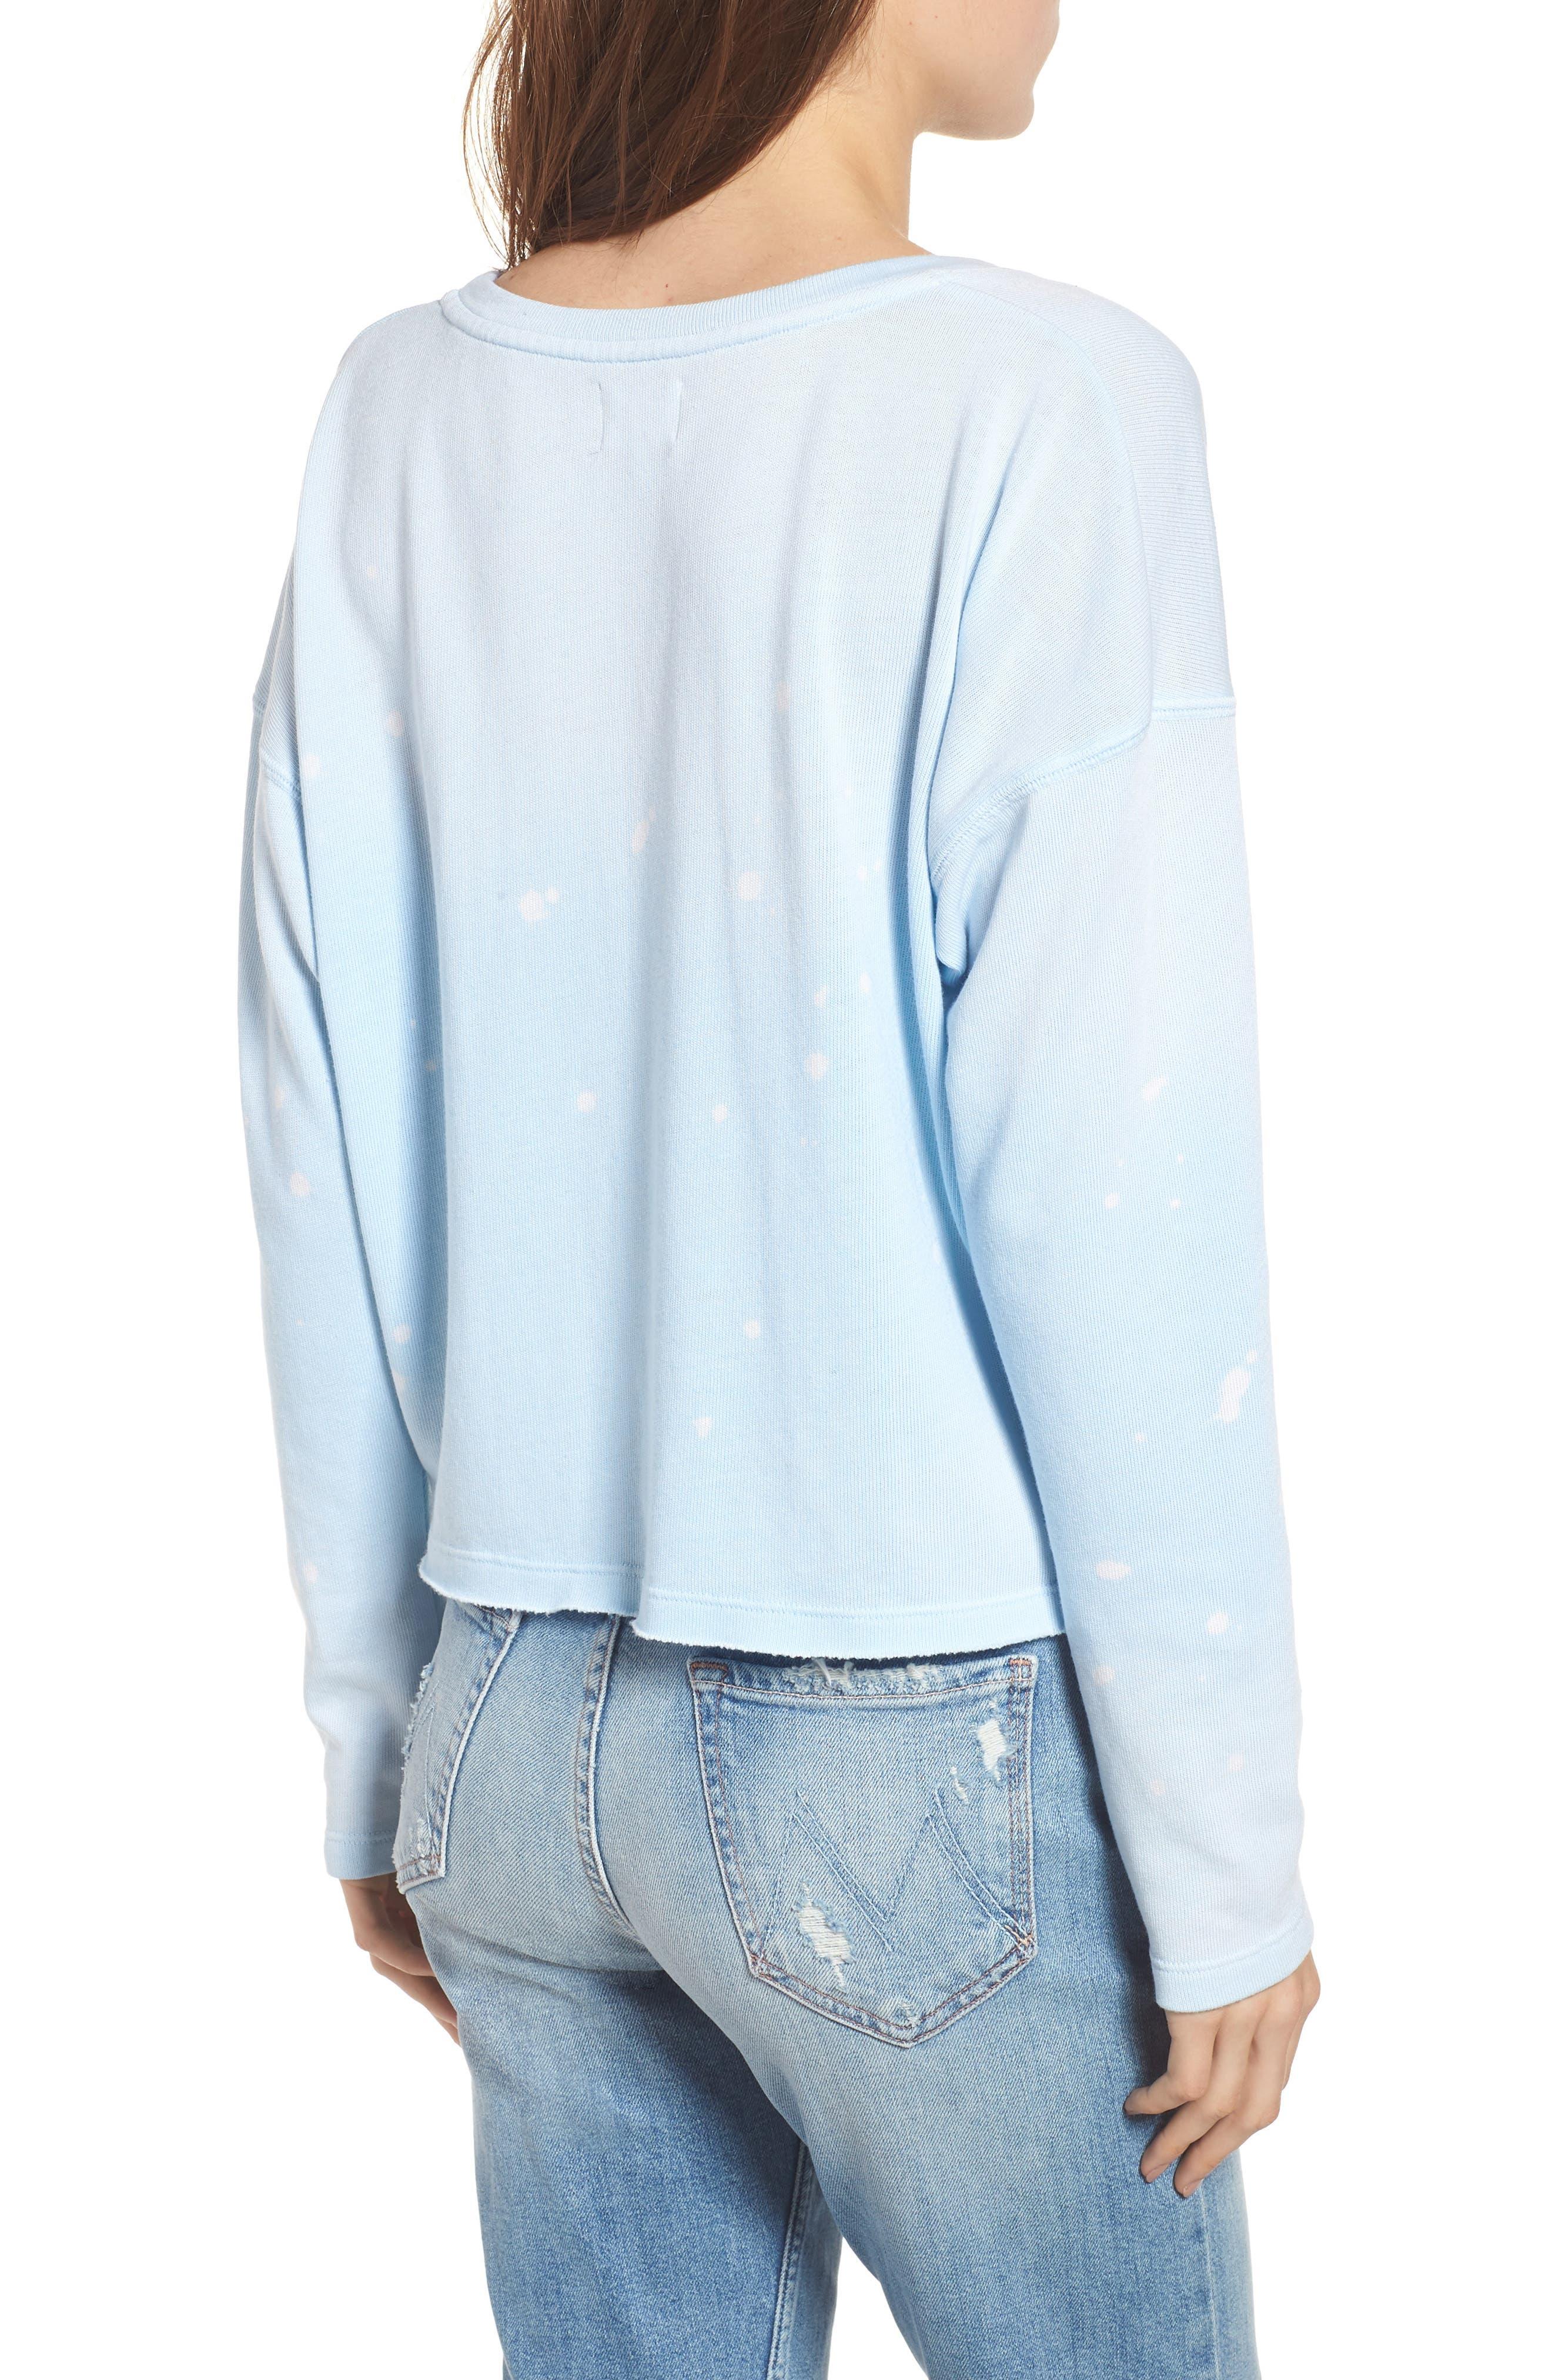 Coco Nuts Light Fleece Sweatshirt,                             Alternate thumbnail 2, color,                             SUN FADED SKY